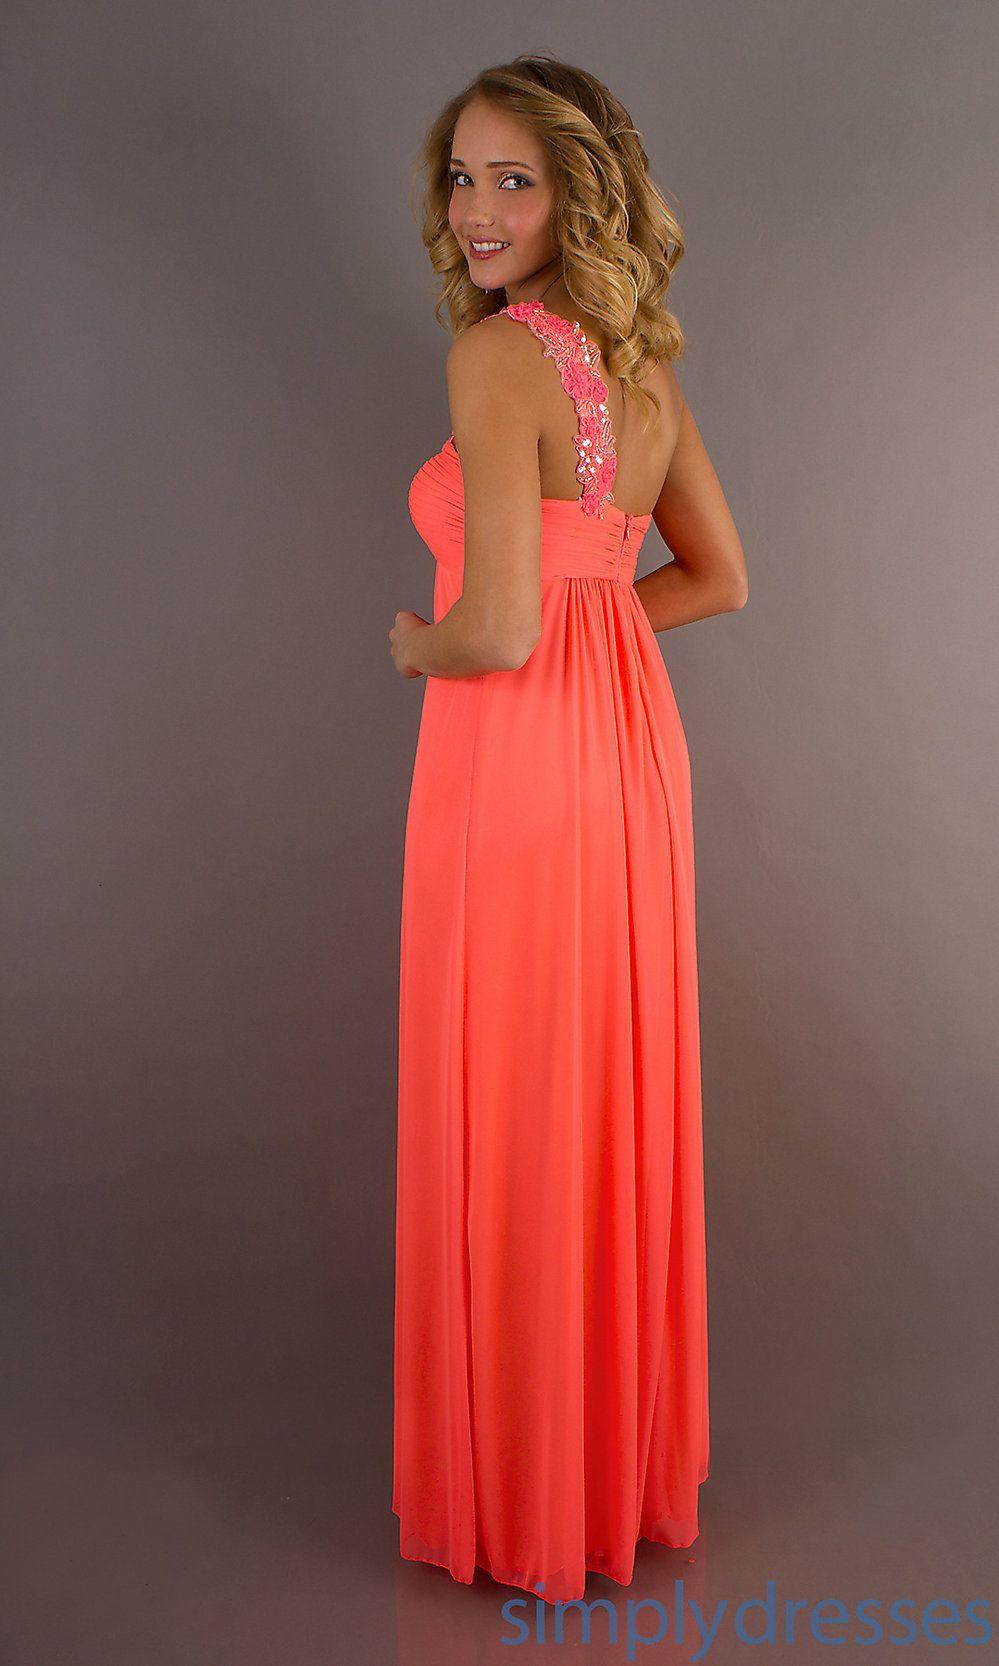 Neon coral chiffon promeveningbridesmaid dresses wedding 3 coral dress ombrellifo Gallery